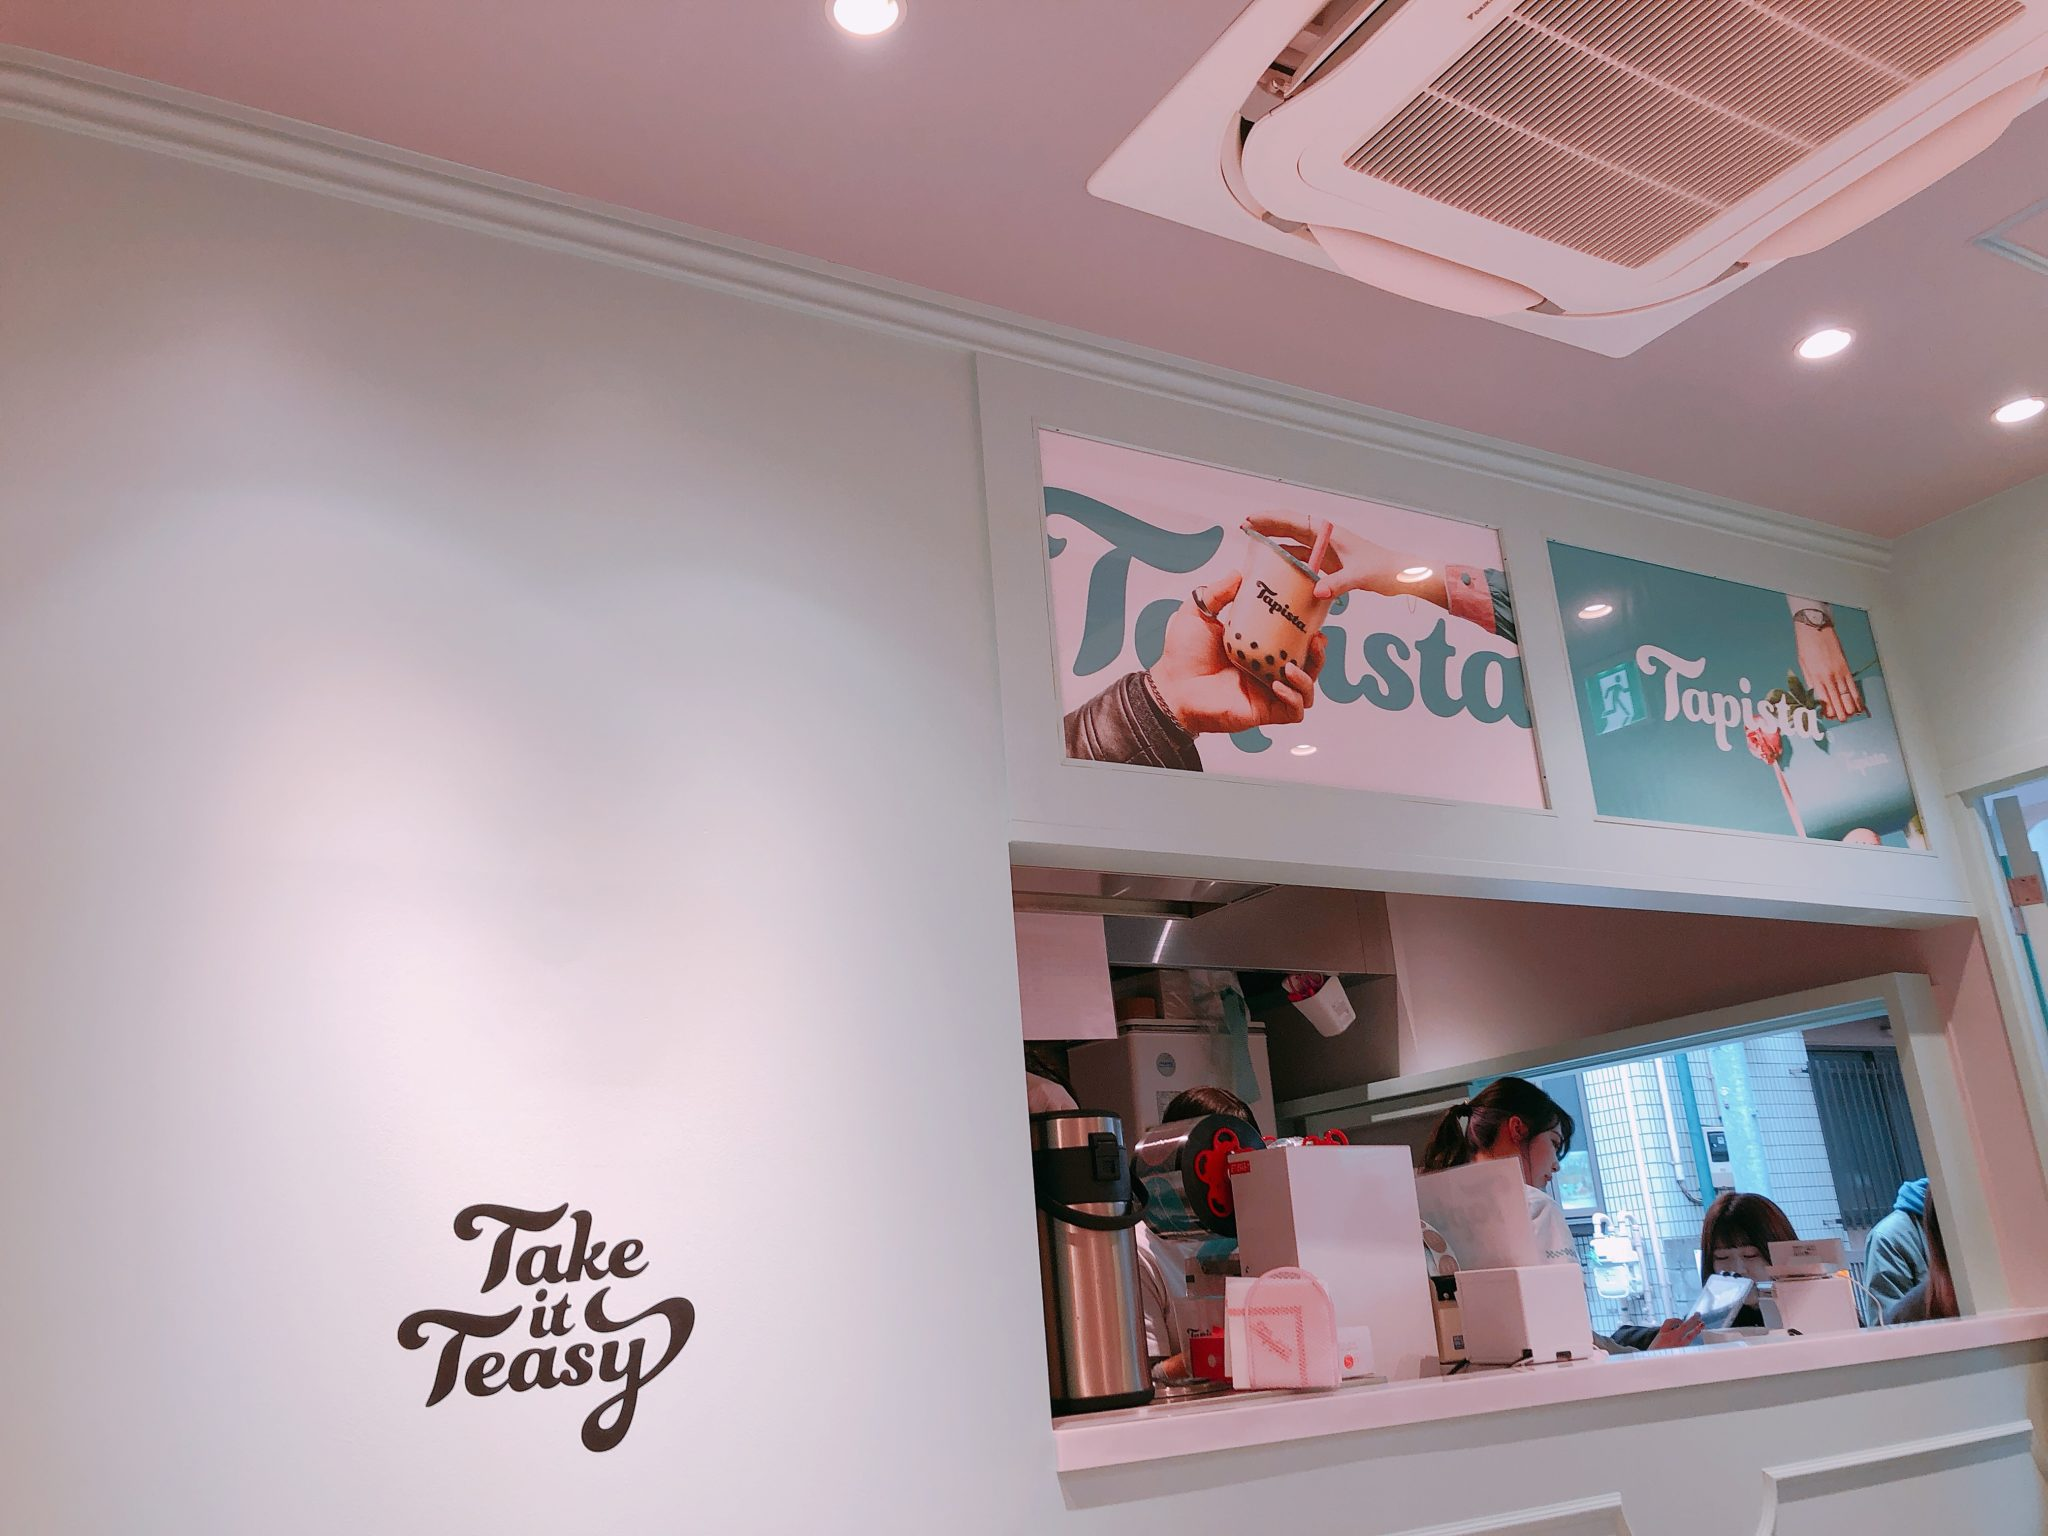 TAPISTA(タピスタ)の店内の様子